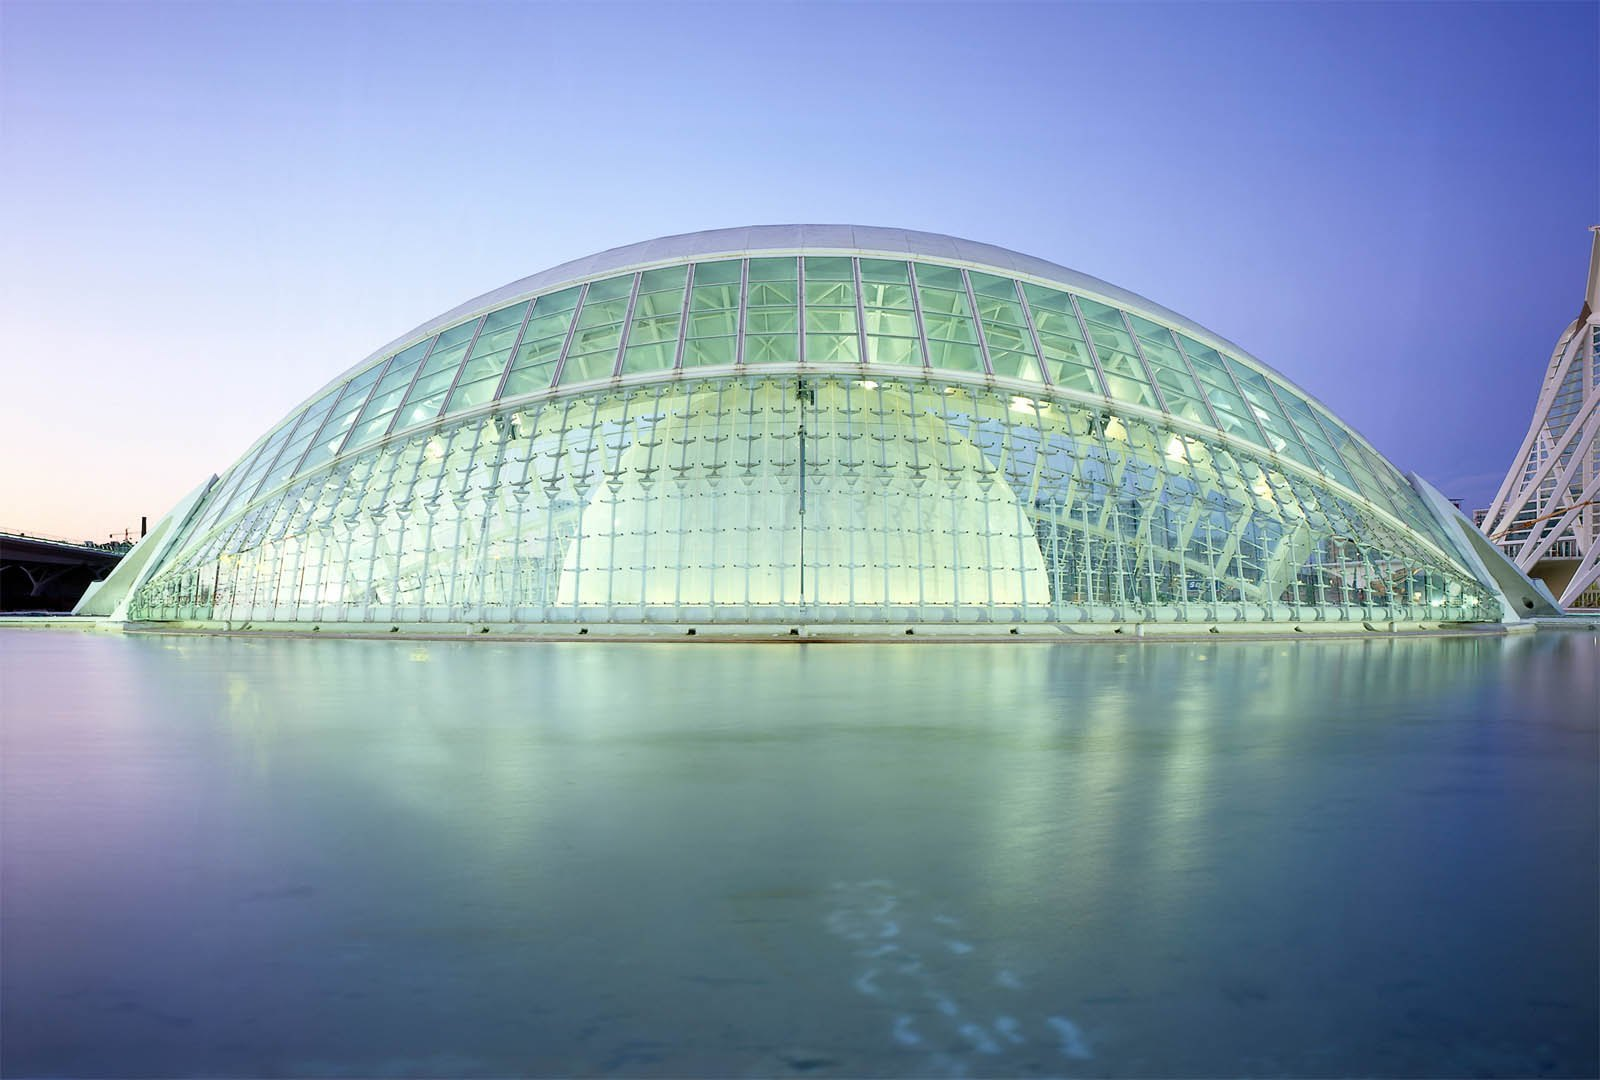 City of the Art and Sciencesの建物の一つ。www.calatrava.comより。